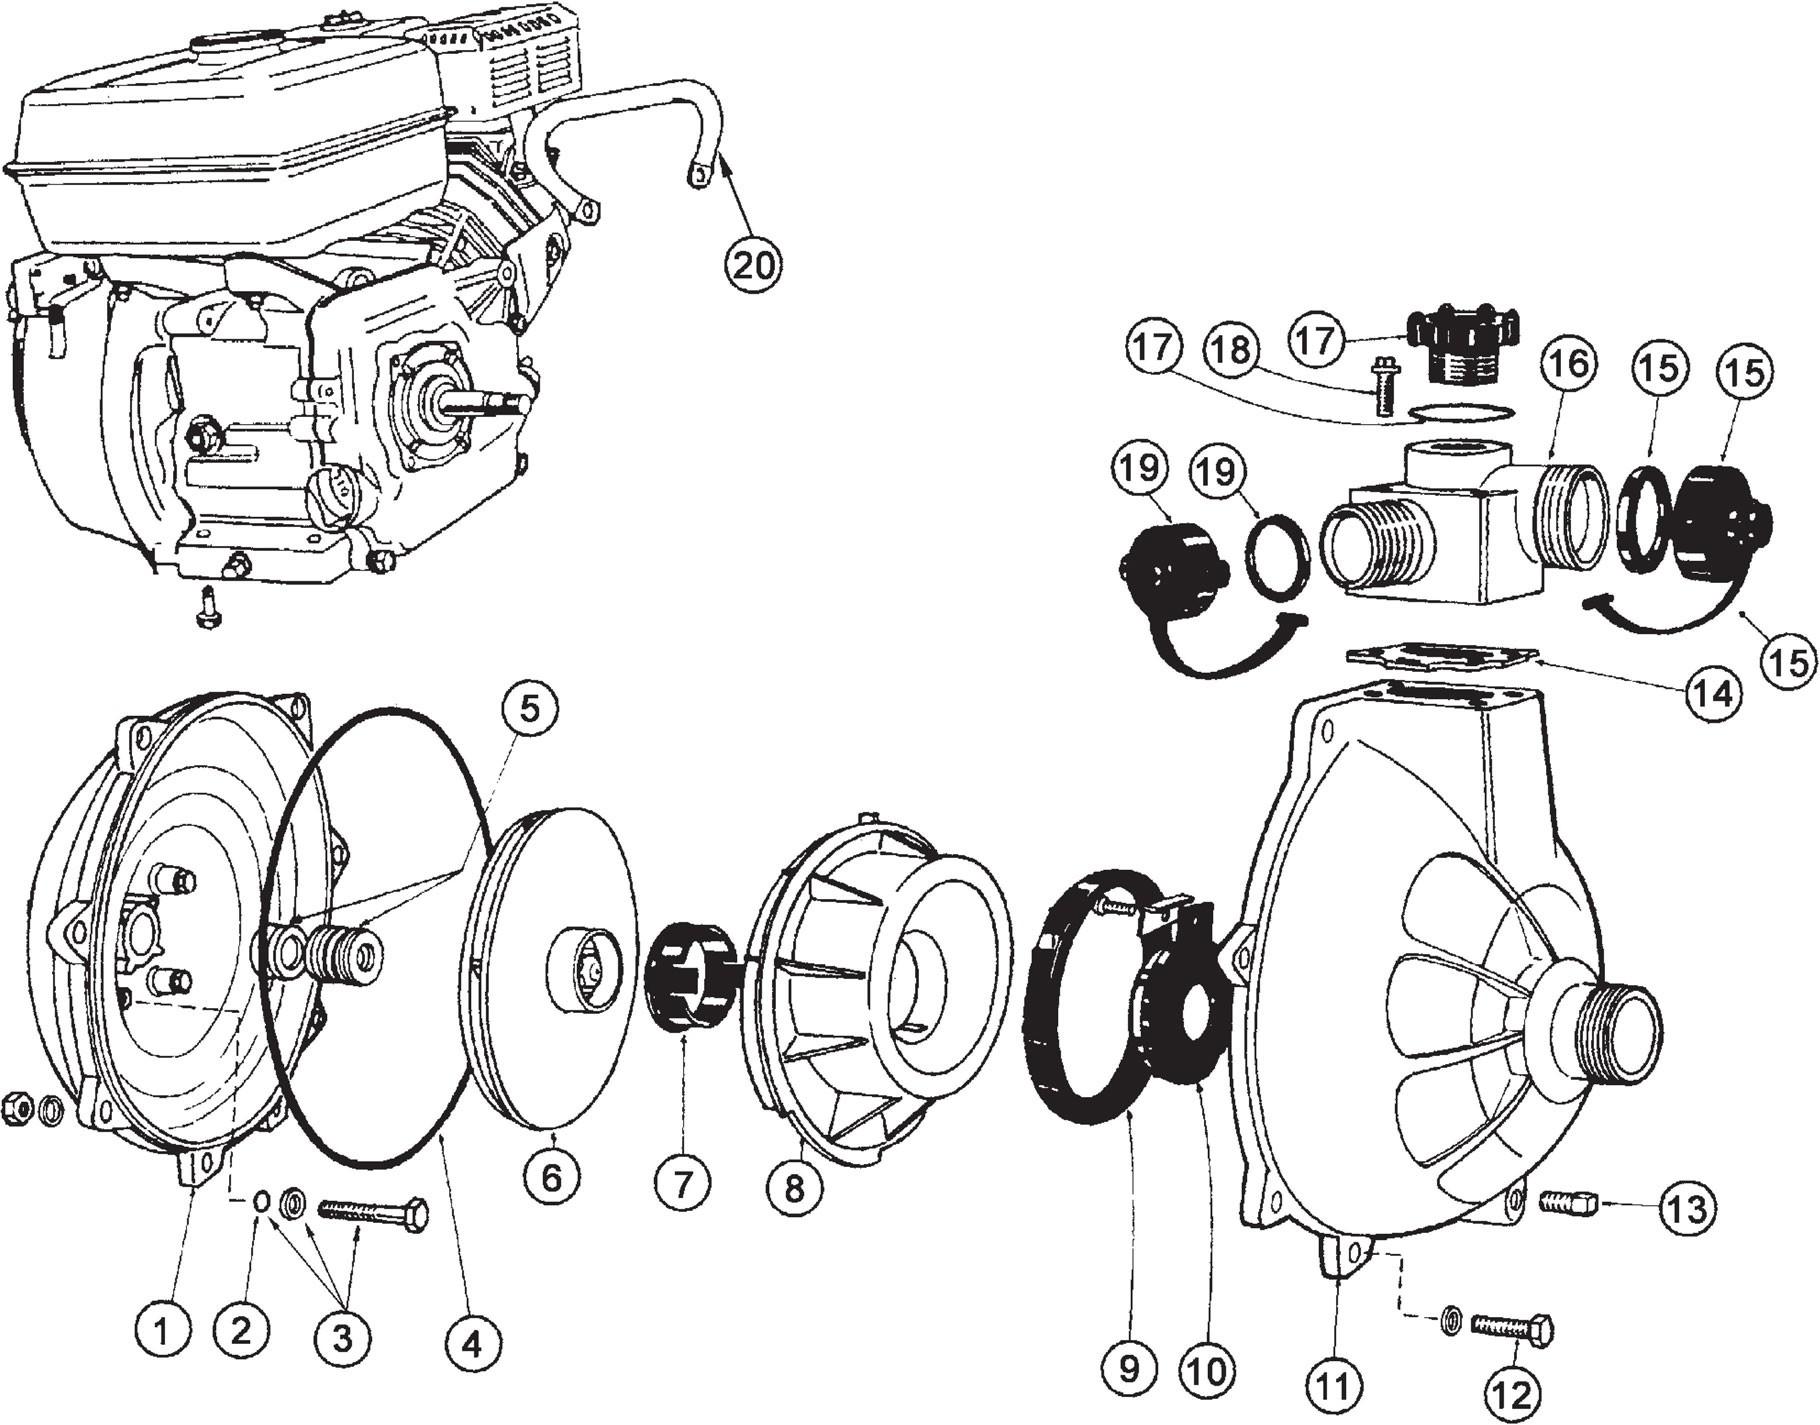 Honda Gc160 Parts Diagram Davey 931 Pump Spares Breakdown Bidgee Pumps & Irrigation Your Of Honda Gc160 Parts Diagram